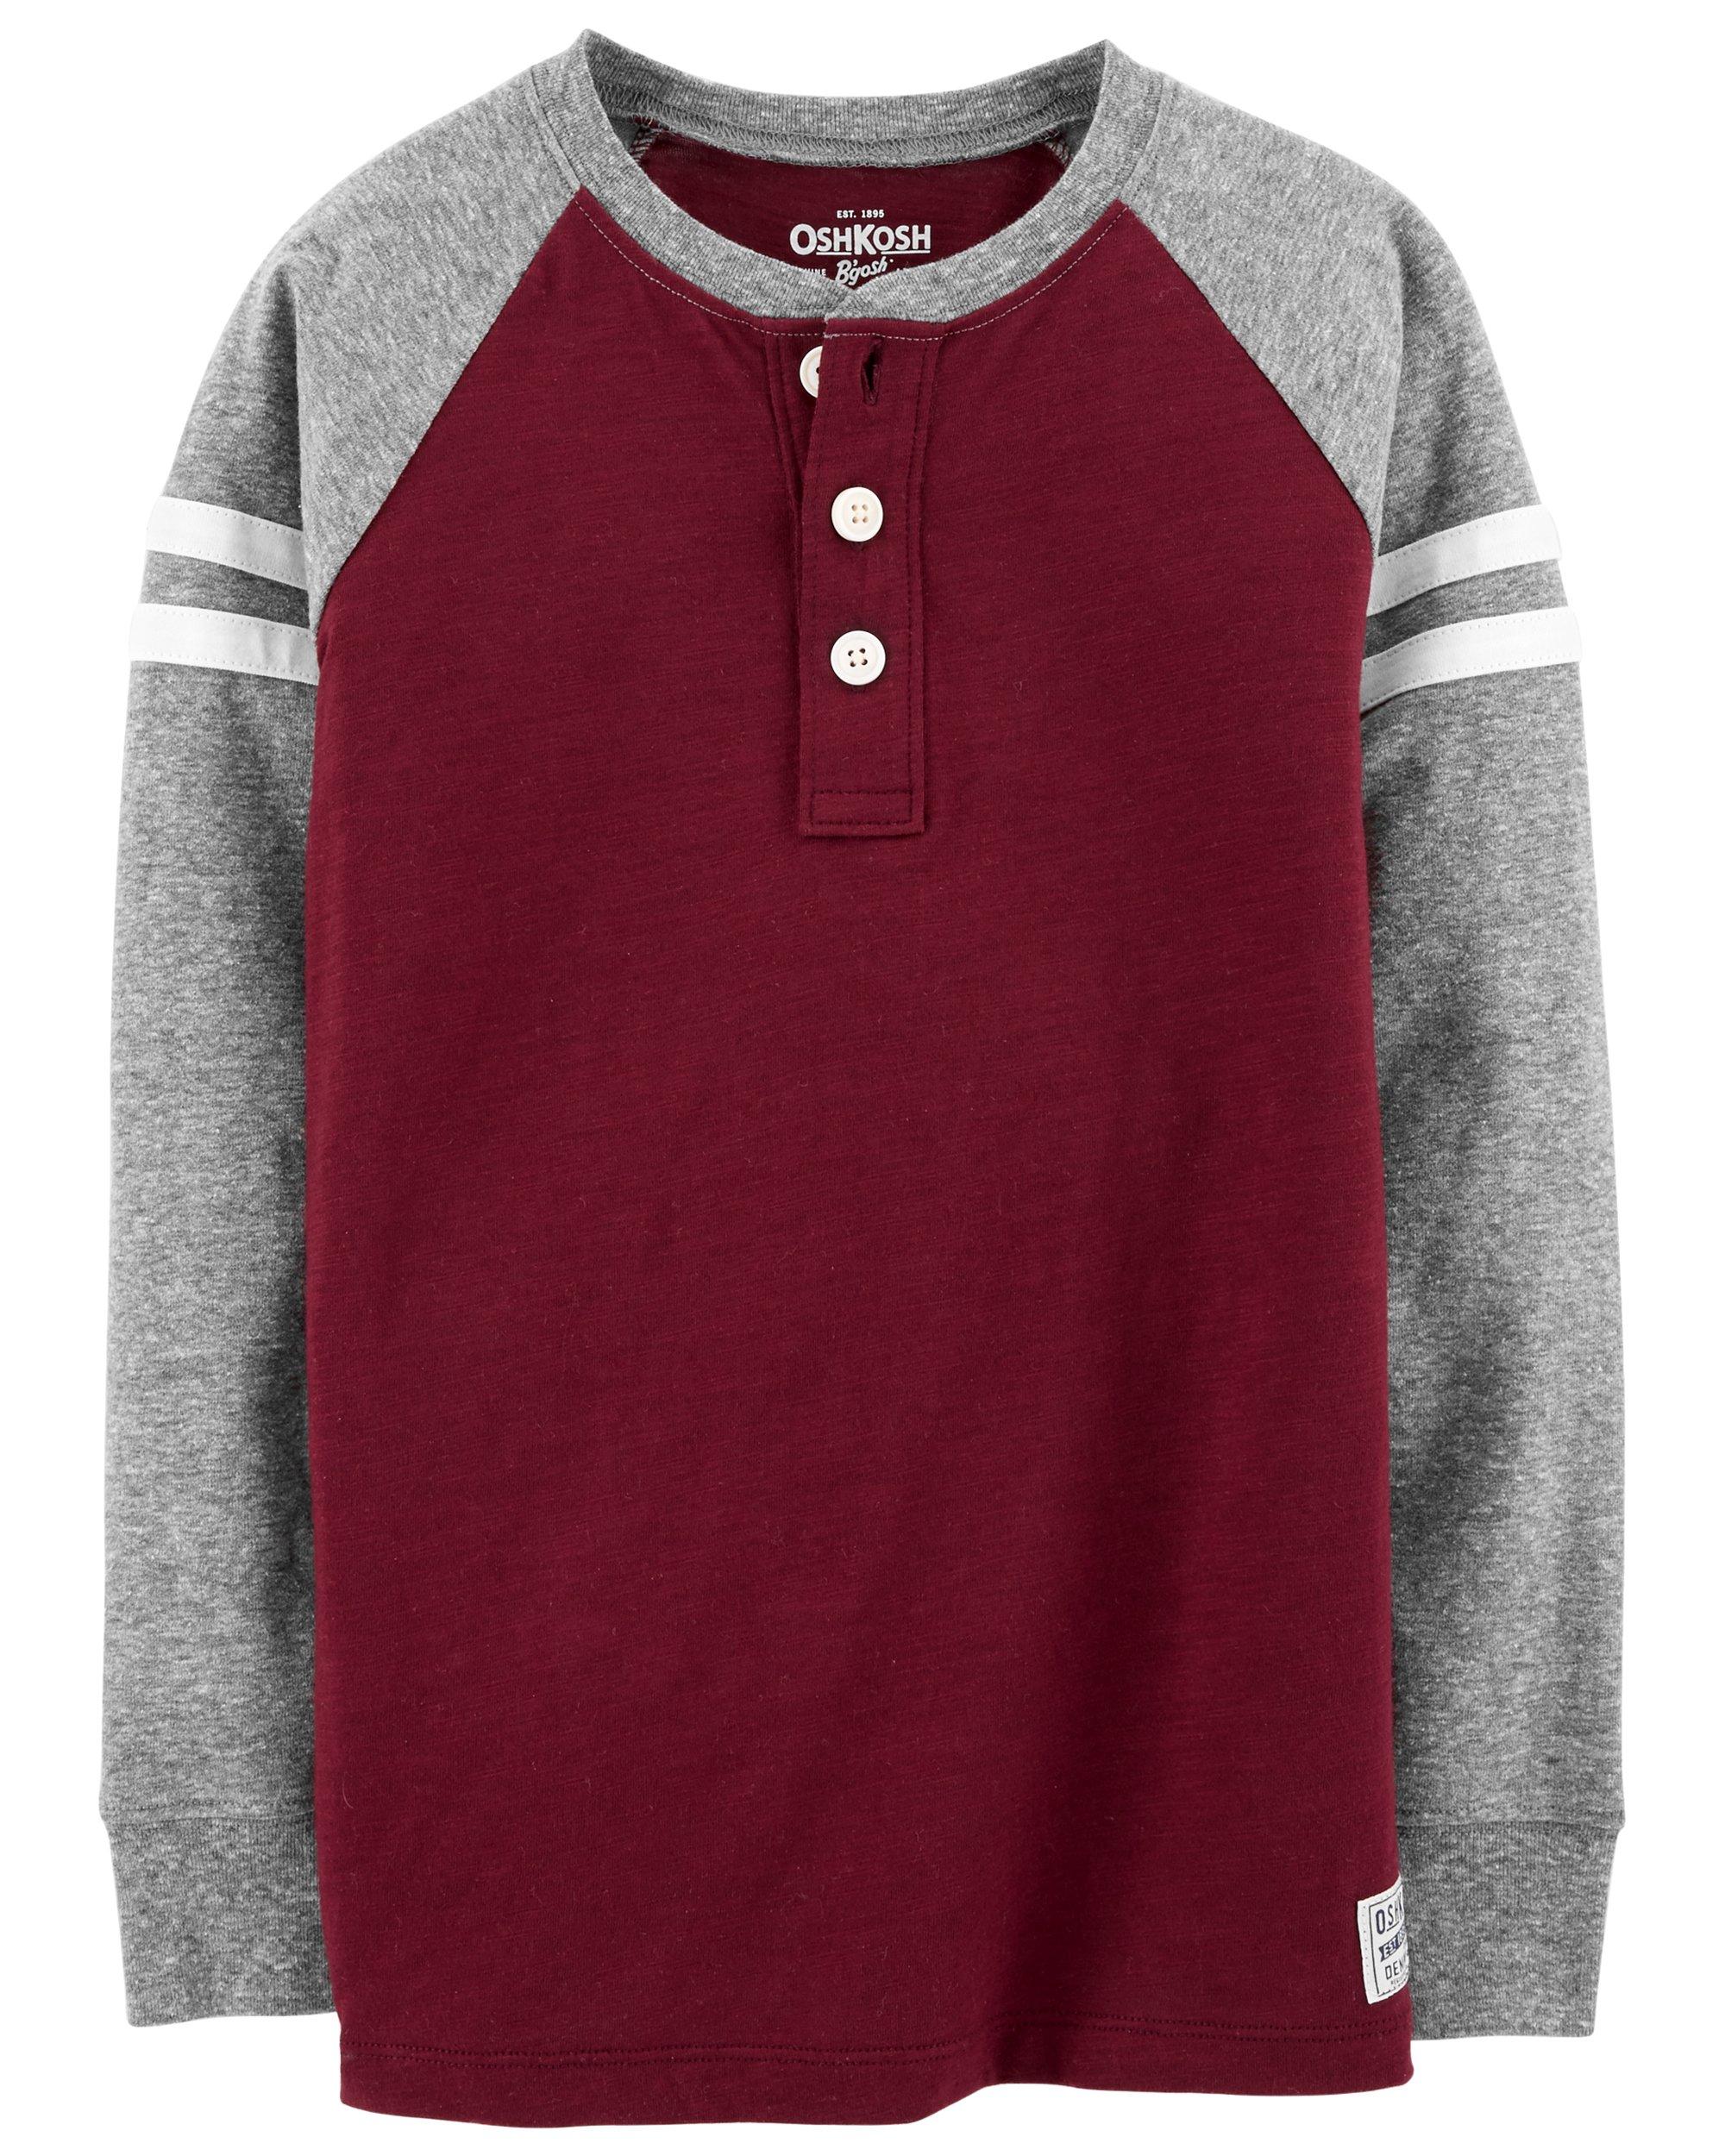 Osh Kosh Boys' Kids Long Sleeve Raglan Henley, Burgundy/Grey, 4-5